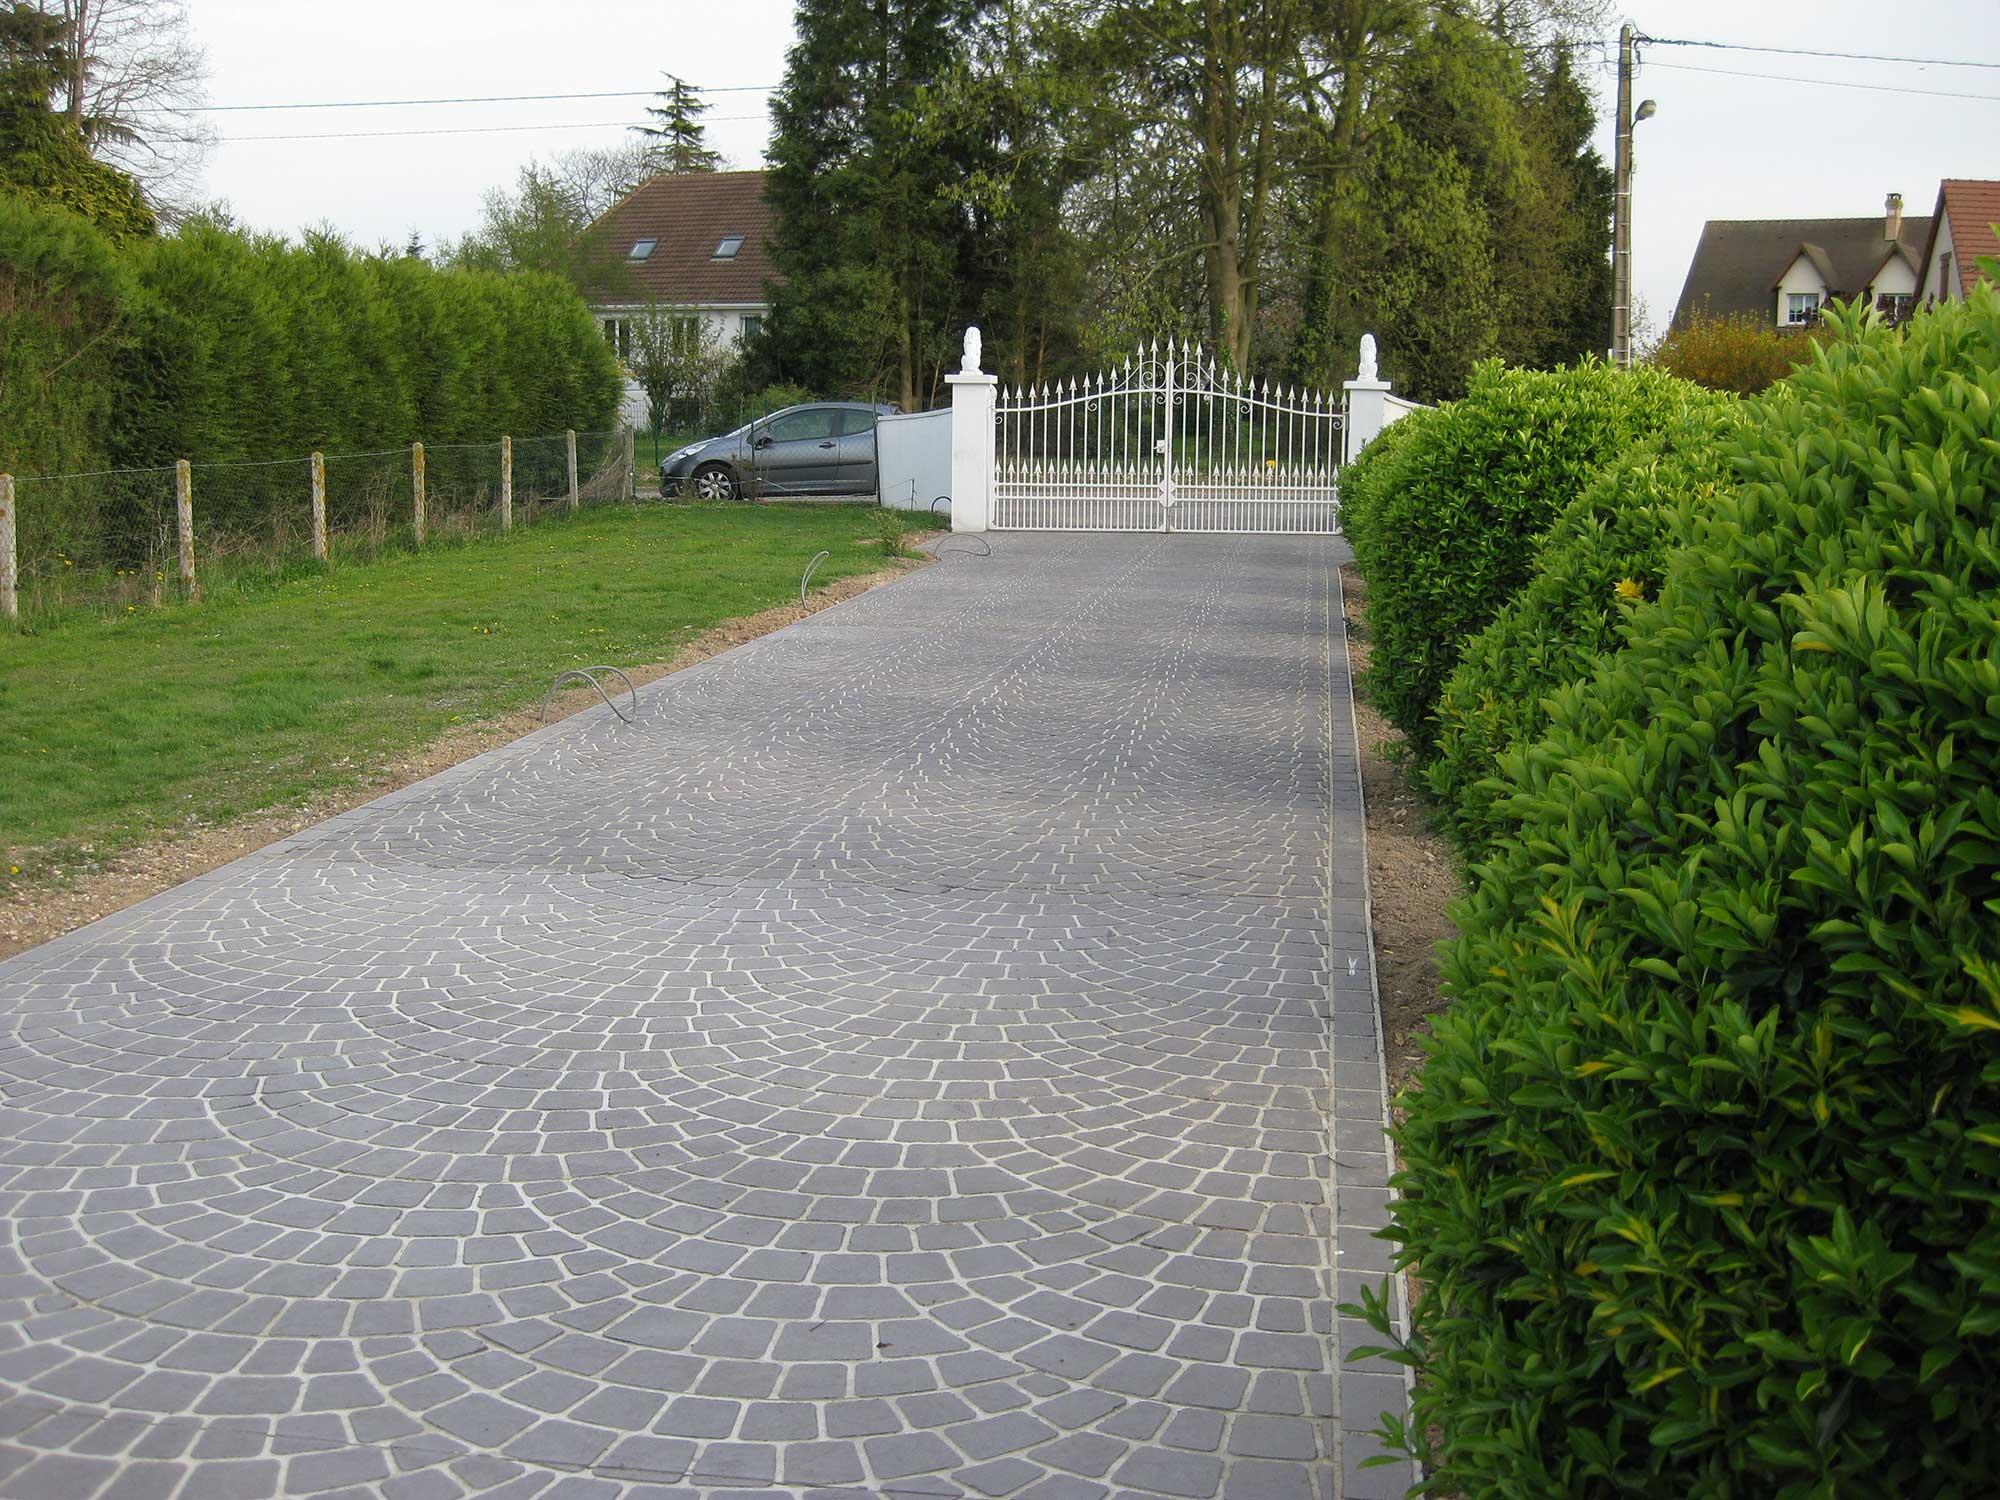 Allee beton alle en bton dsactiv with allee beton for Cailloux allee de garage